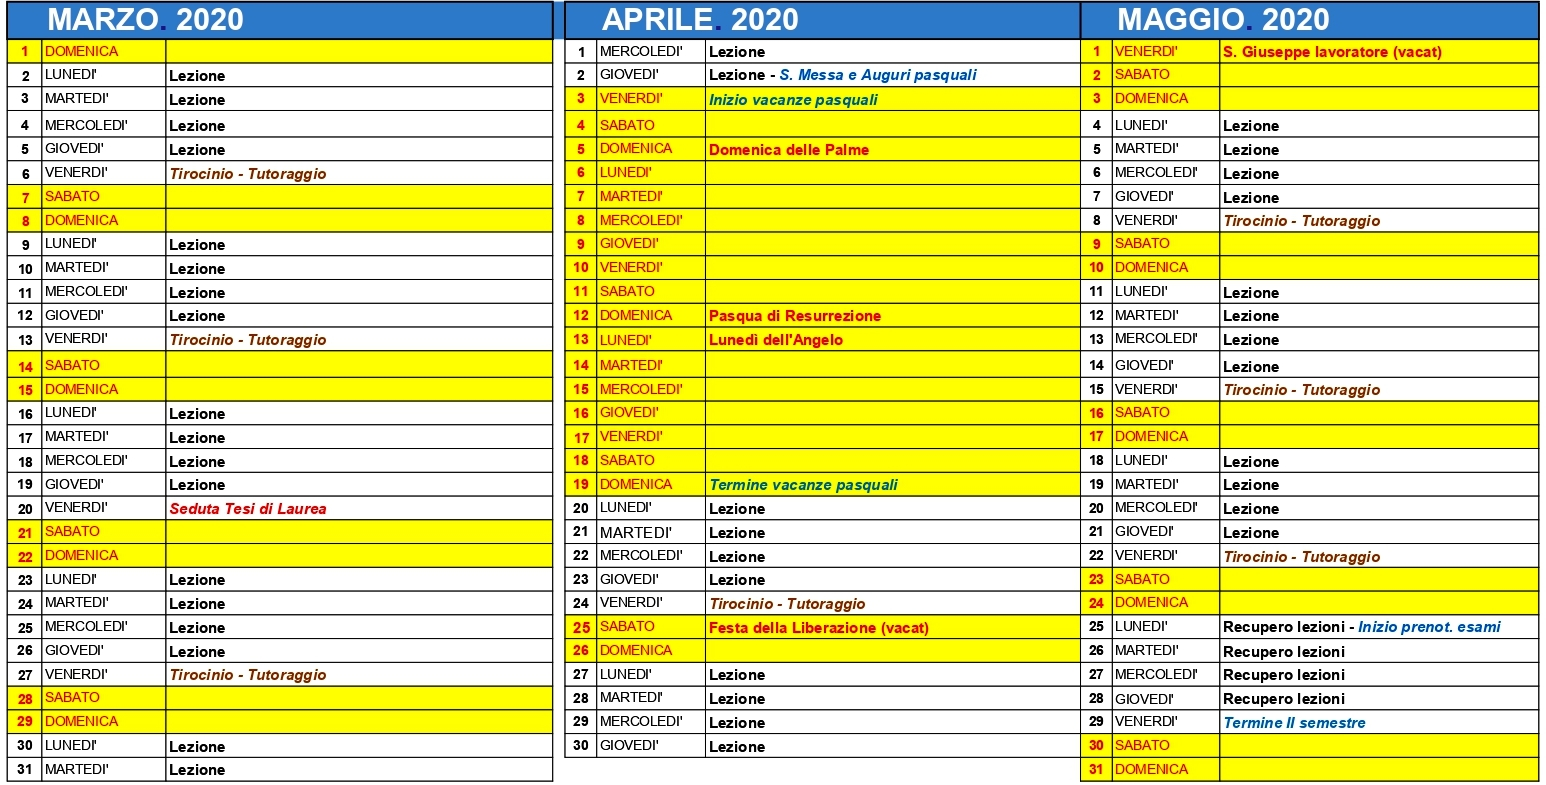 Calendario Pastorale 2020.Calendario Accademico Istituto Superiore Di Scienze